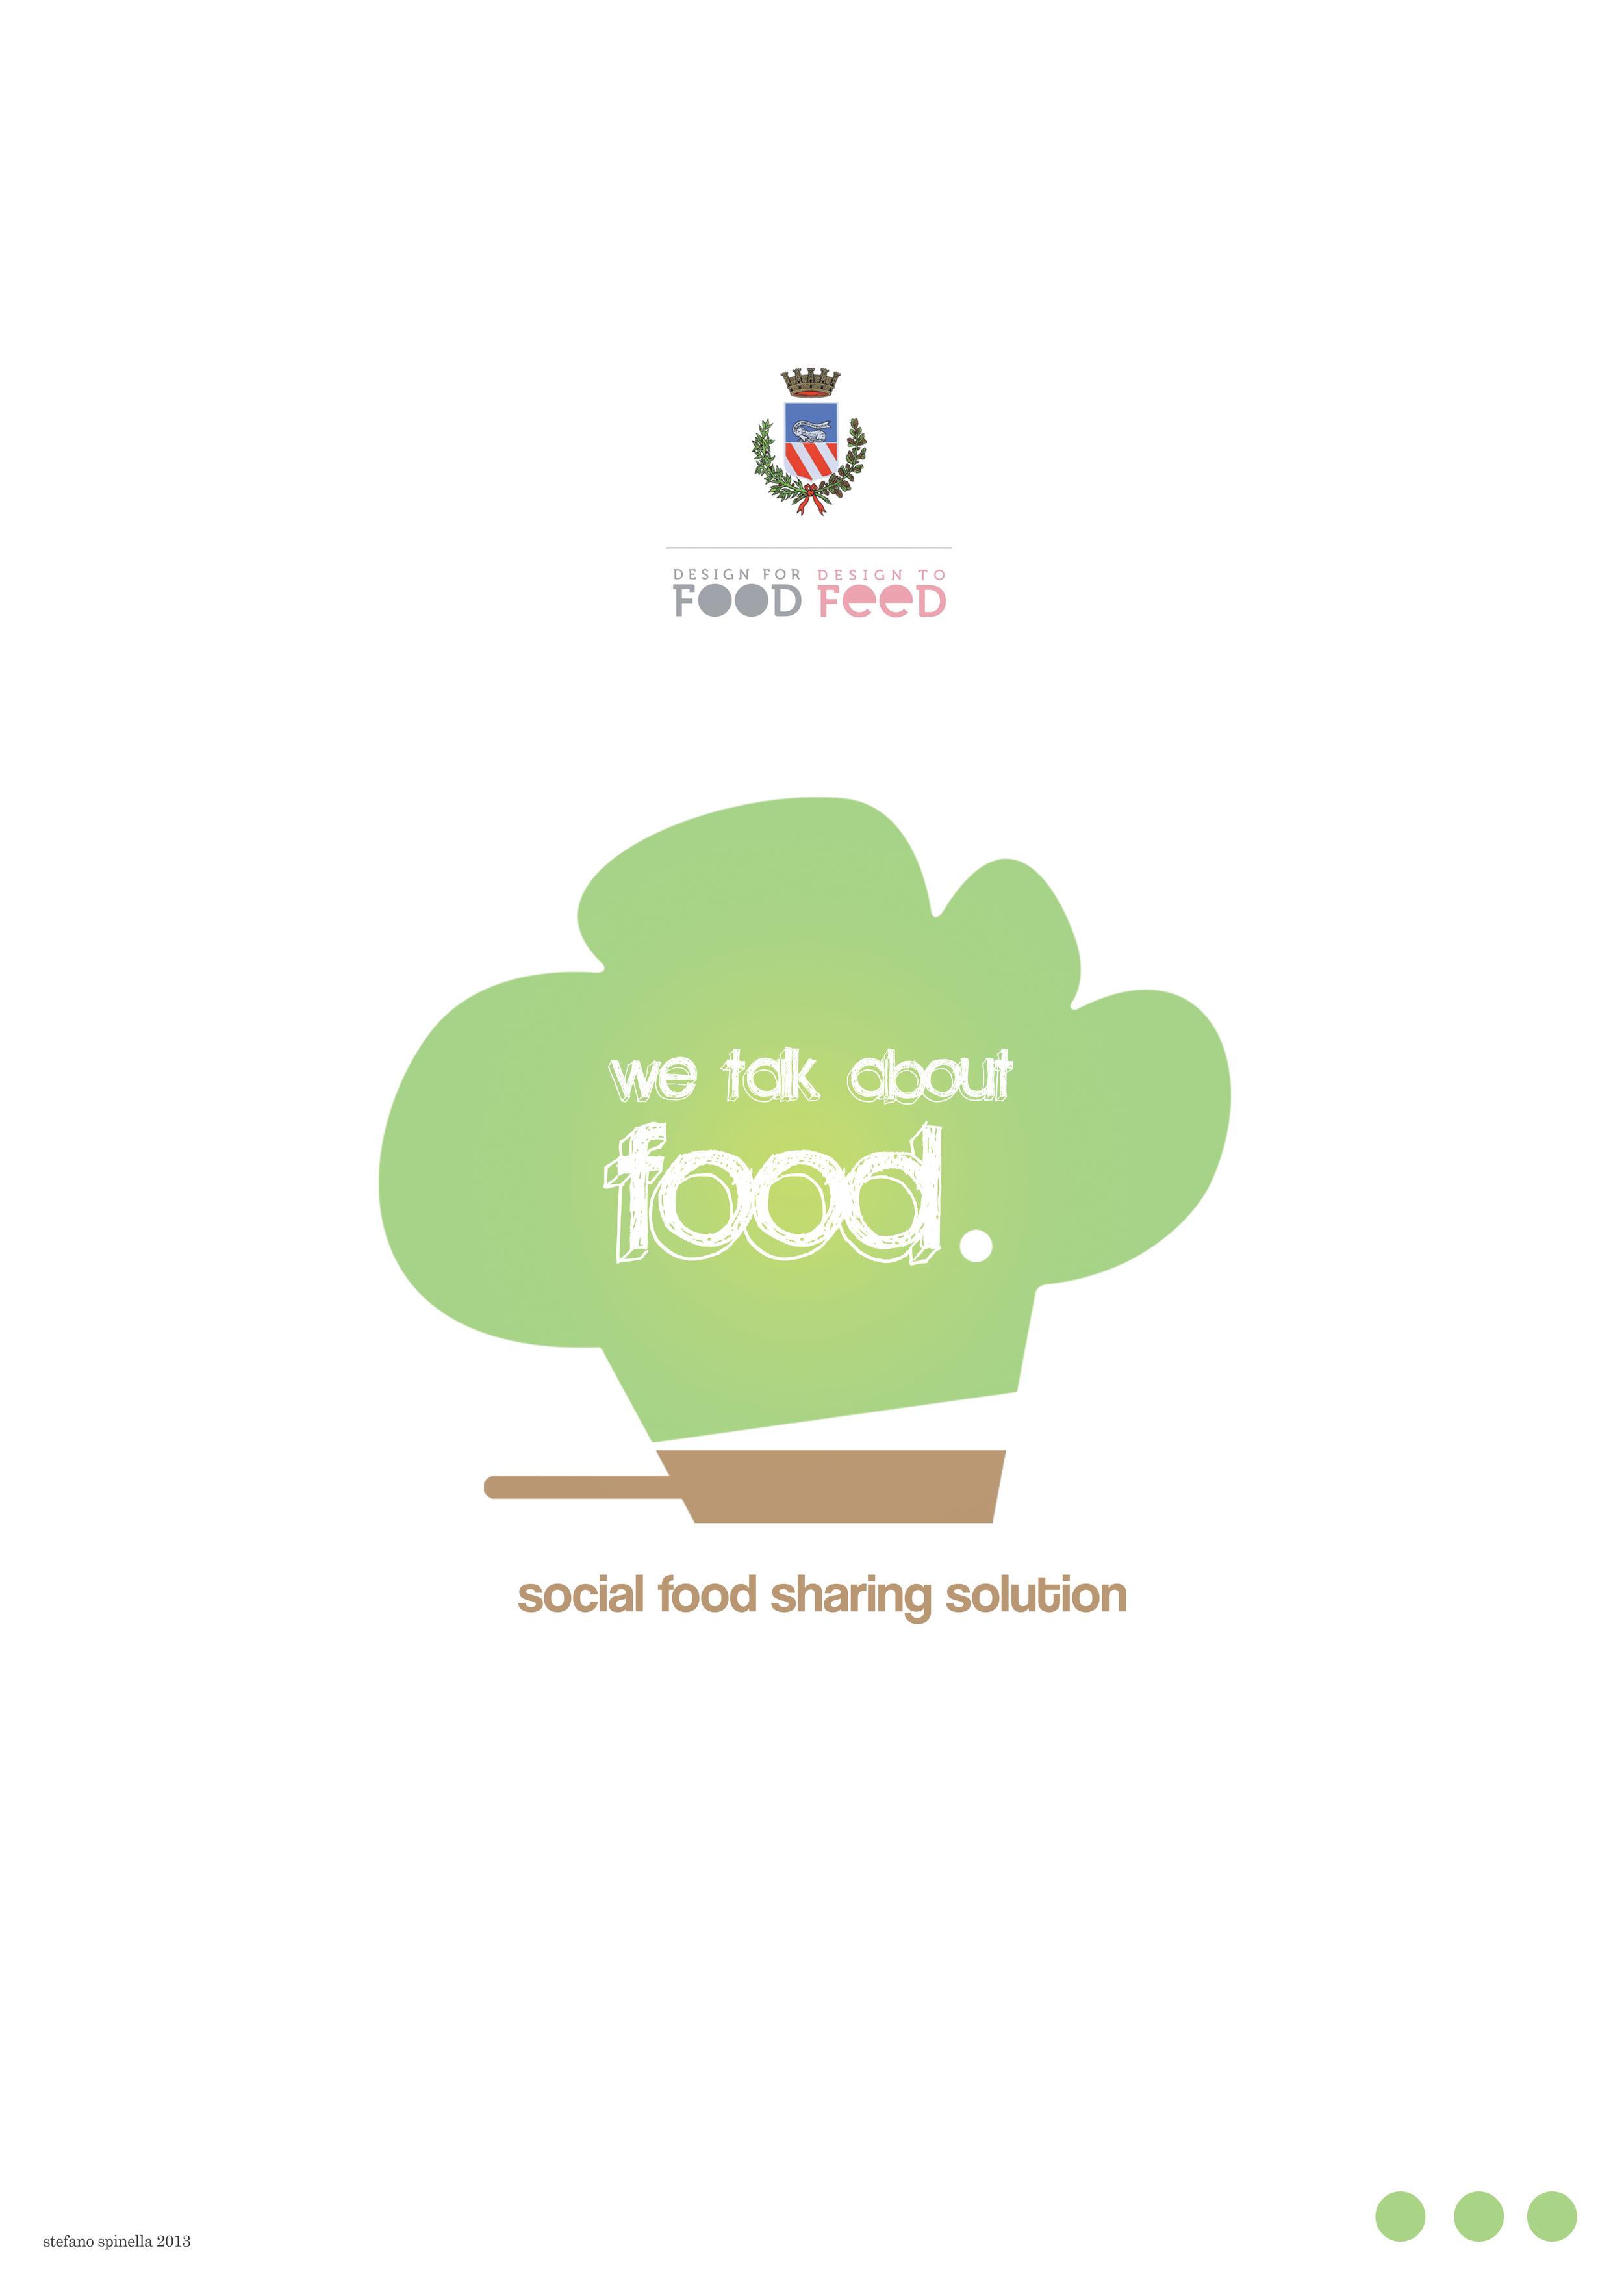 2013 Premio Lissone Design_A_We Talk About Food_01_High.jpg